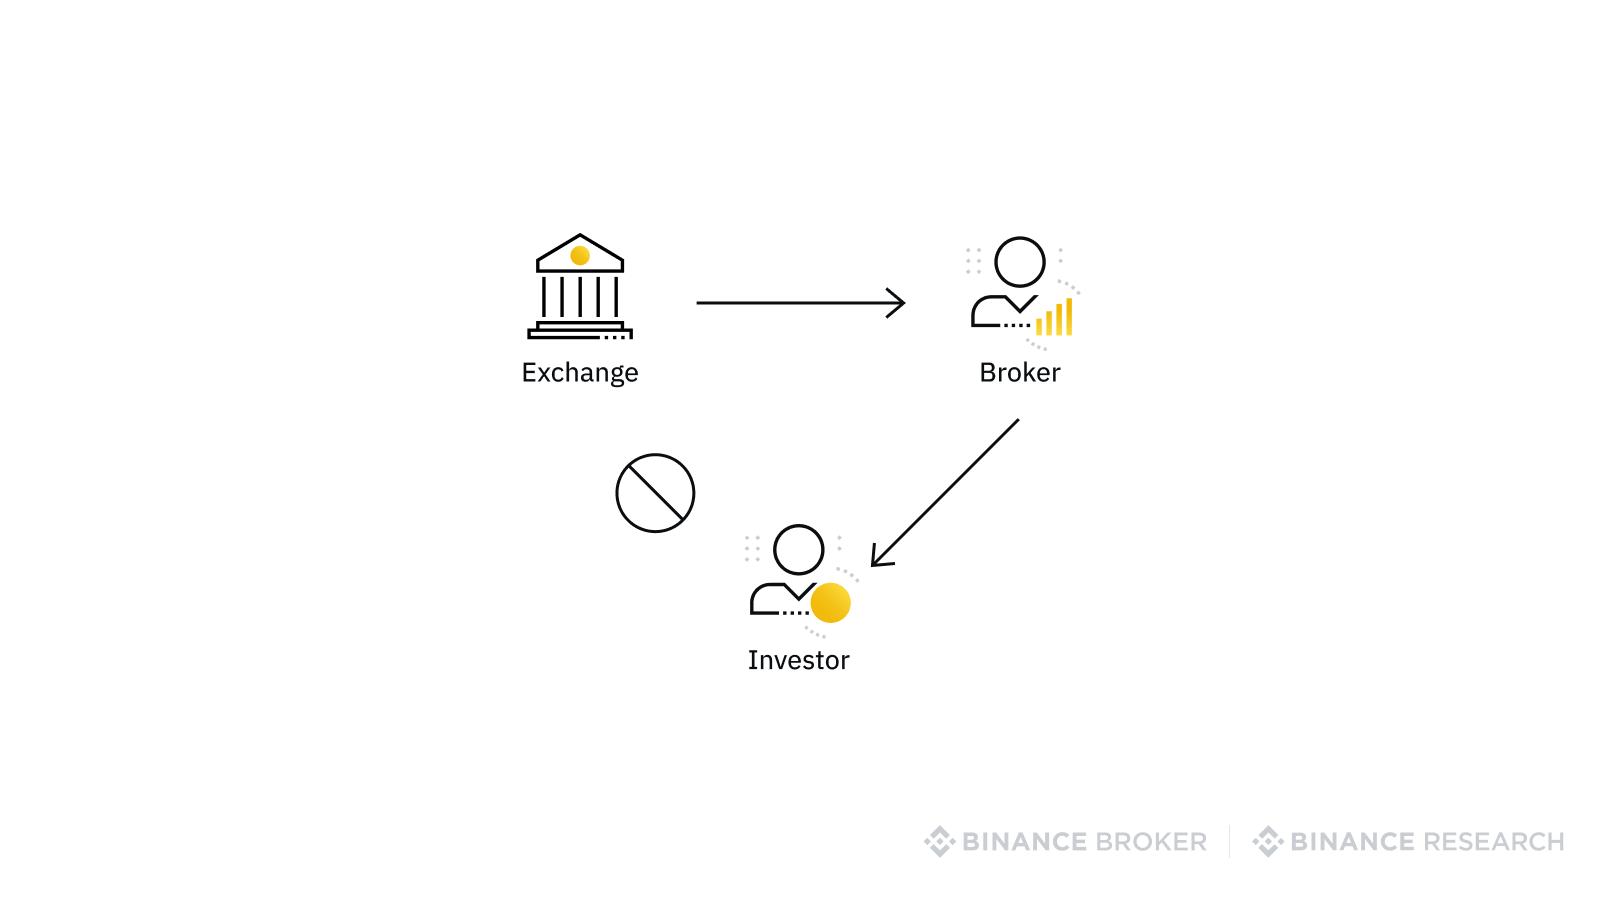 equity brokerage industry organization